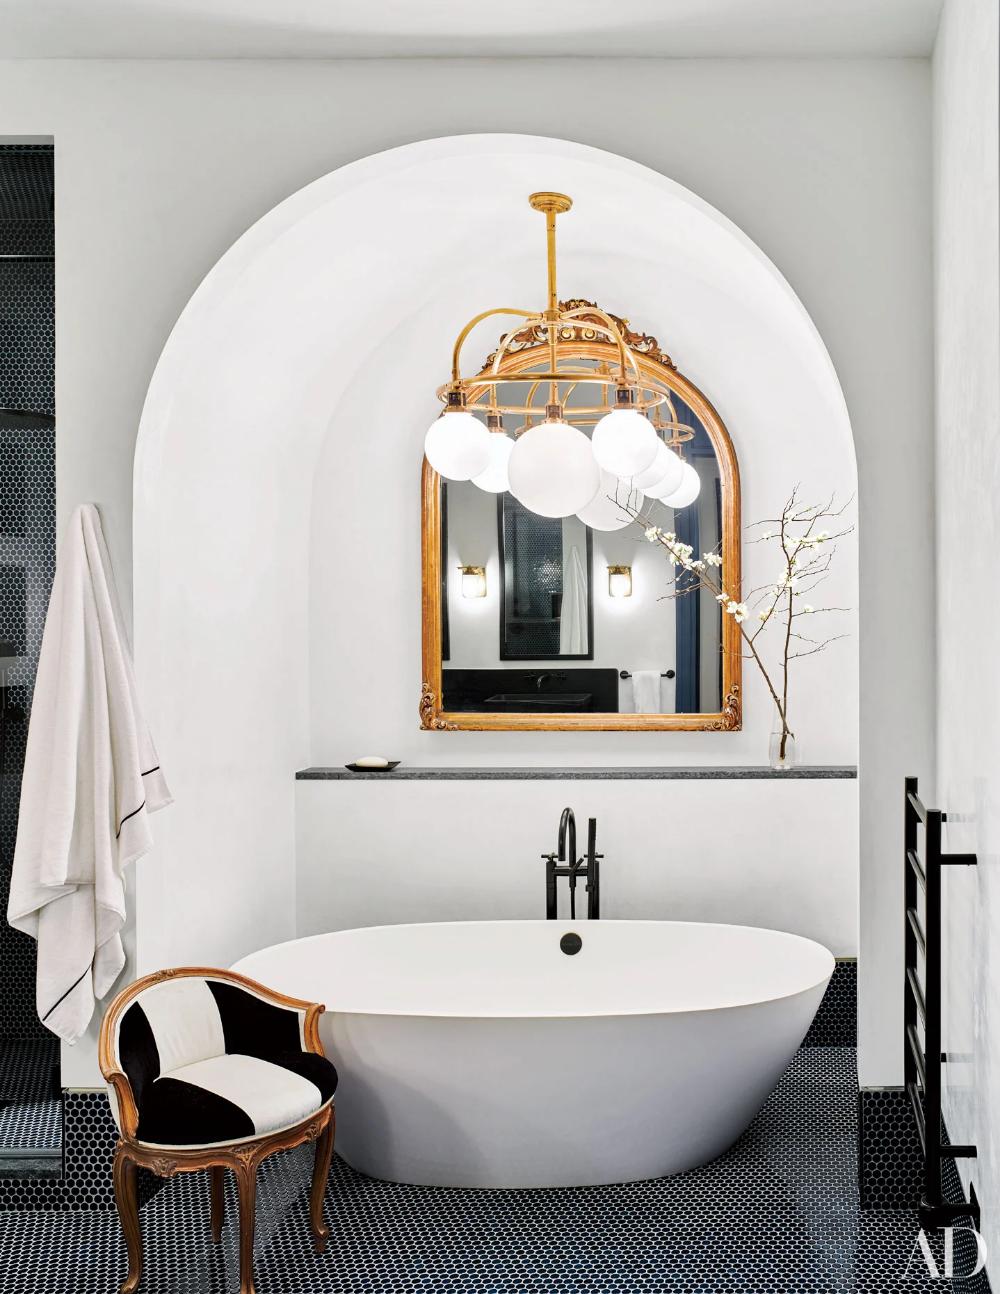 22 Luxury Bathrooms In Celebrity Homes Bathroom Wall Decor Bathroom Mirror Design Small Bathroom Mirrors [ 1294 x 1000 Pixel ]